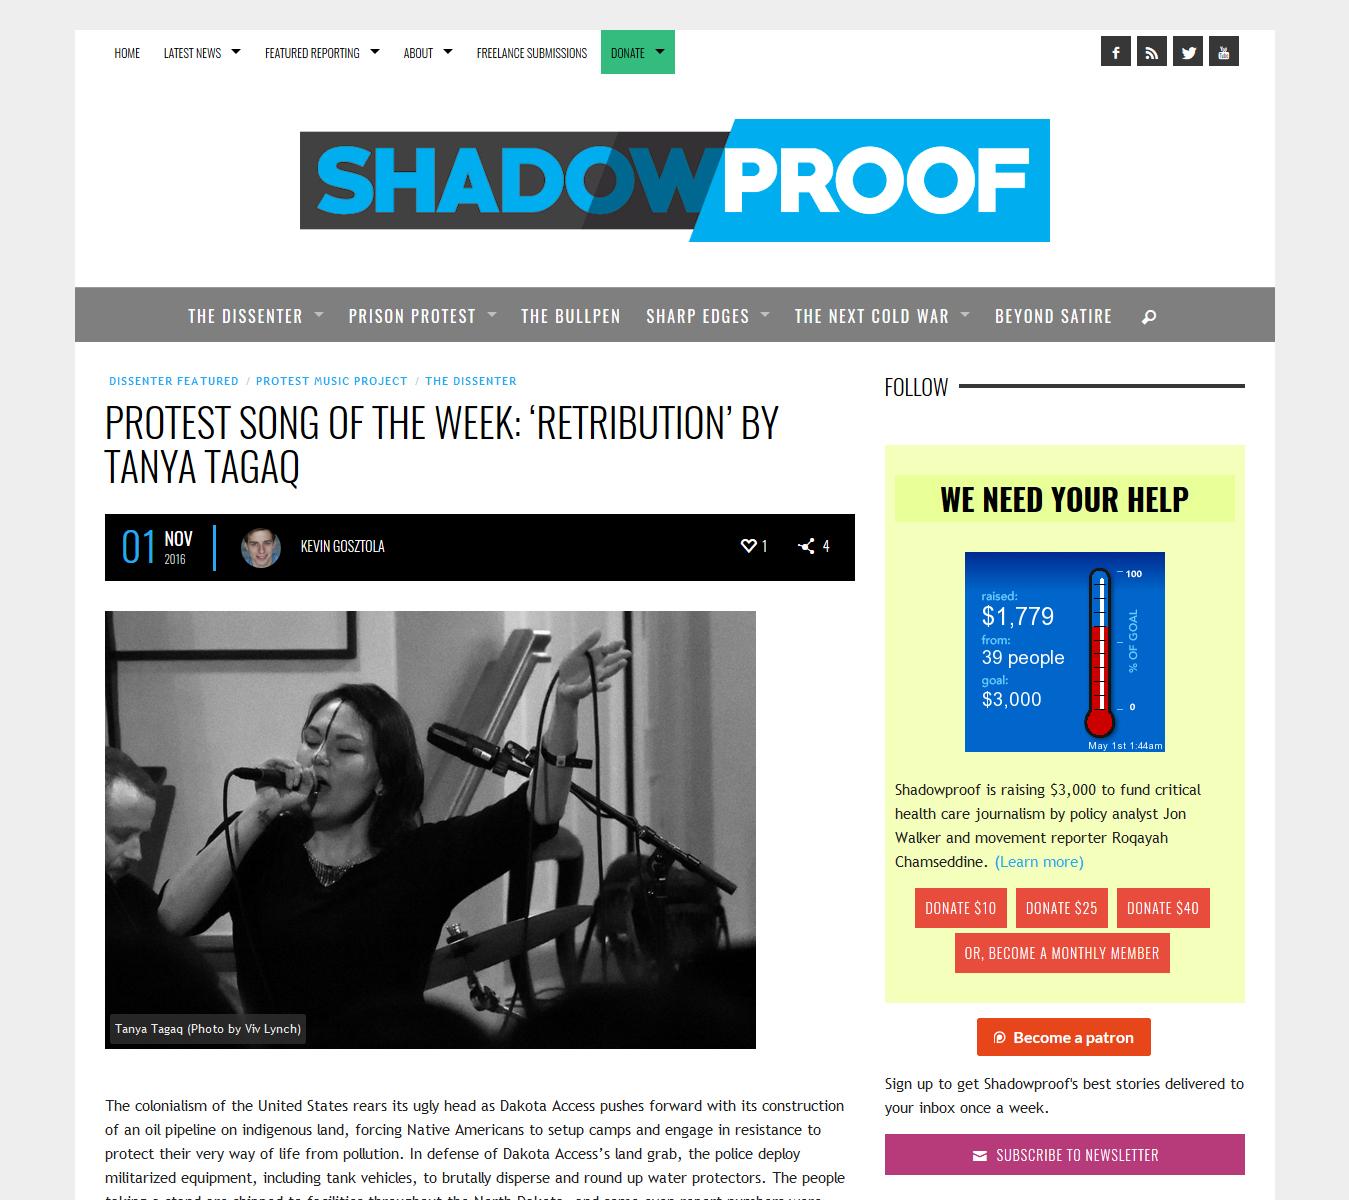 screenshot-shadowproof.com 2017-05-01 01-46-36.jpg